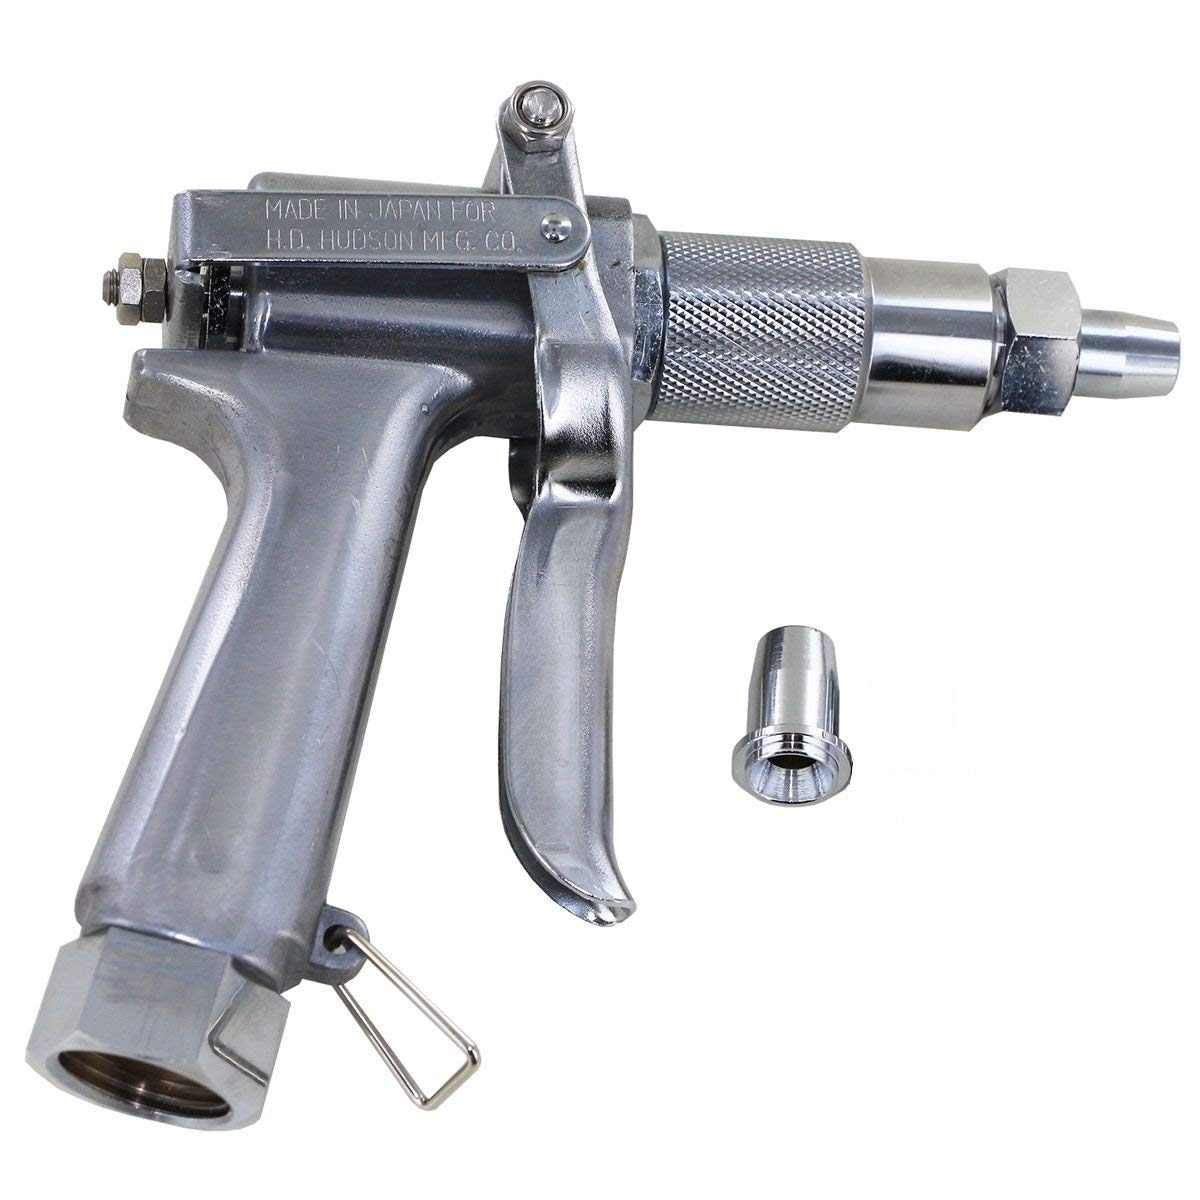 Green Garde JD9-C Spray Gun with Small and Medium Nozzle Bundle, 3 Items